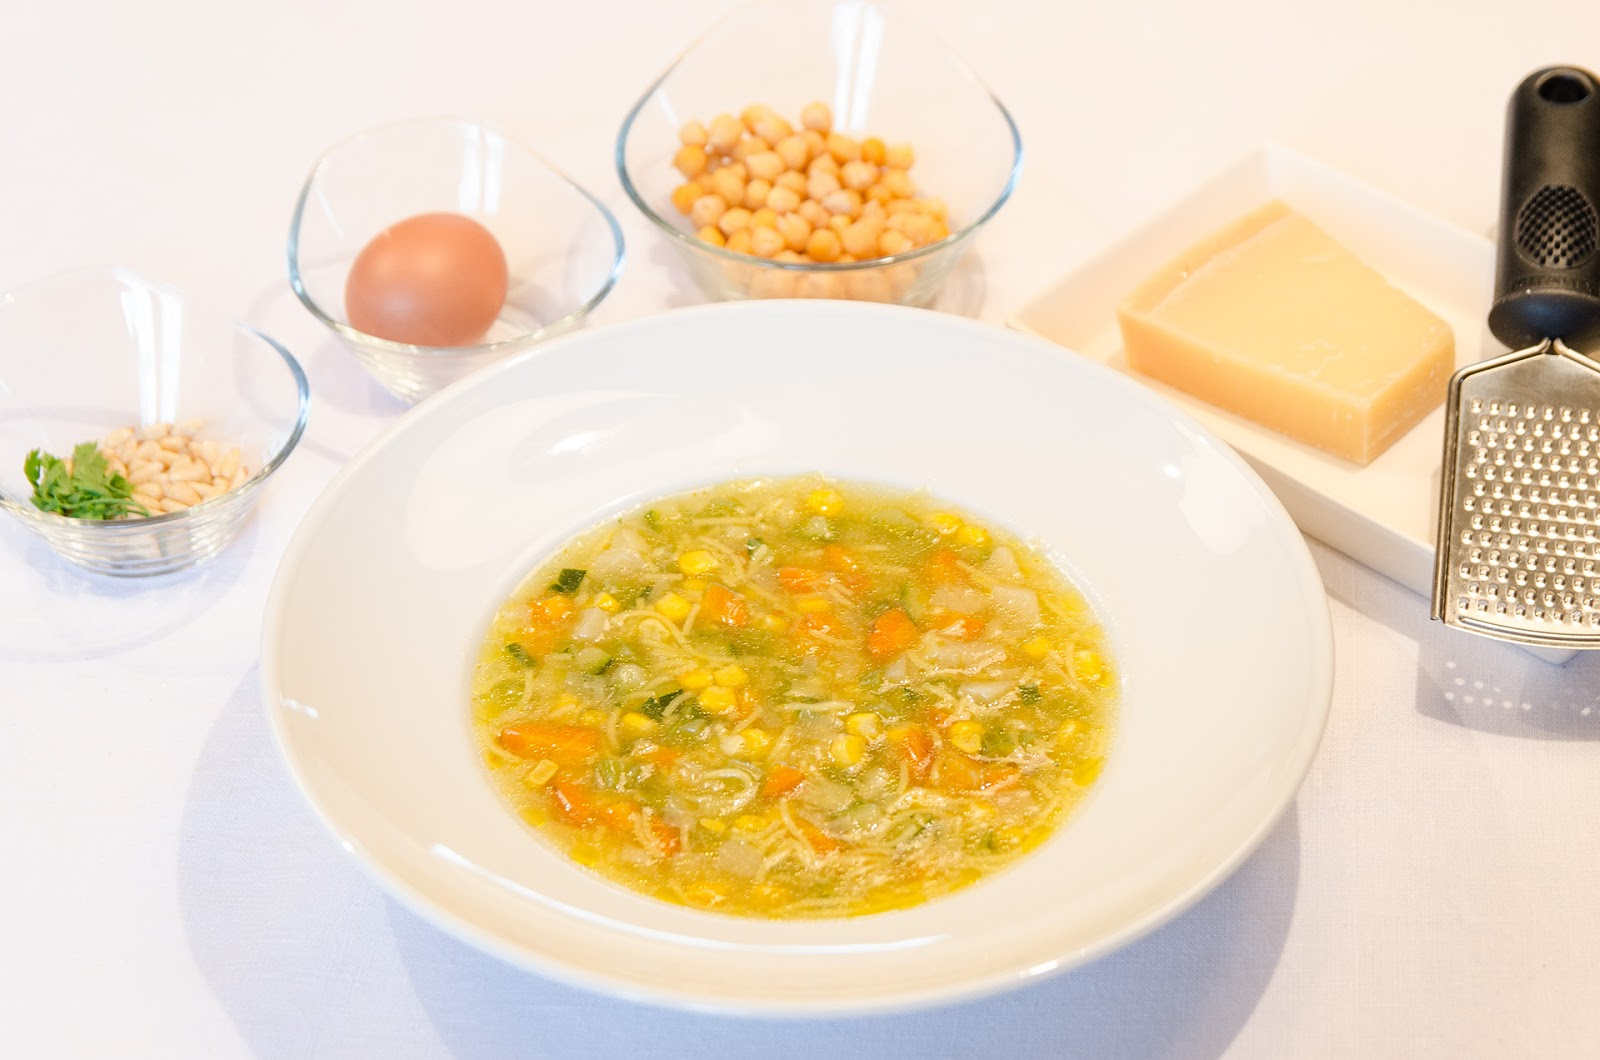 receta-adelgazar-sopa-verduras-dieta-ligera-sana-saludable-cocina-completa-garbanzos-bruja